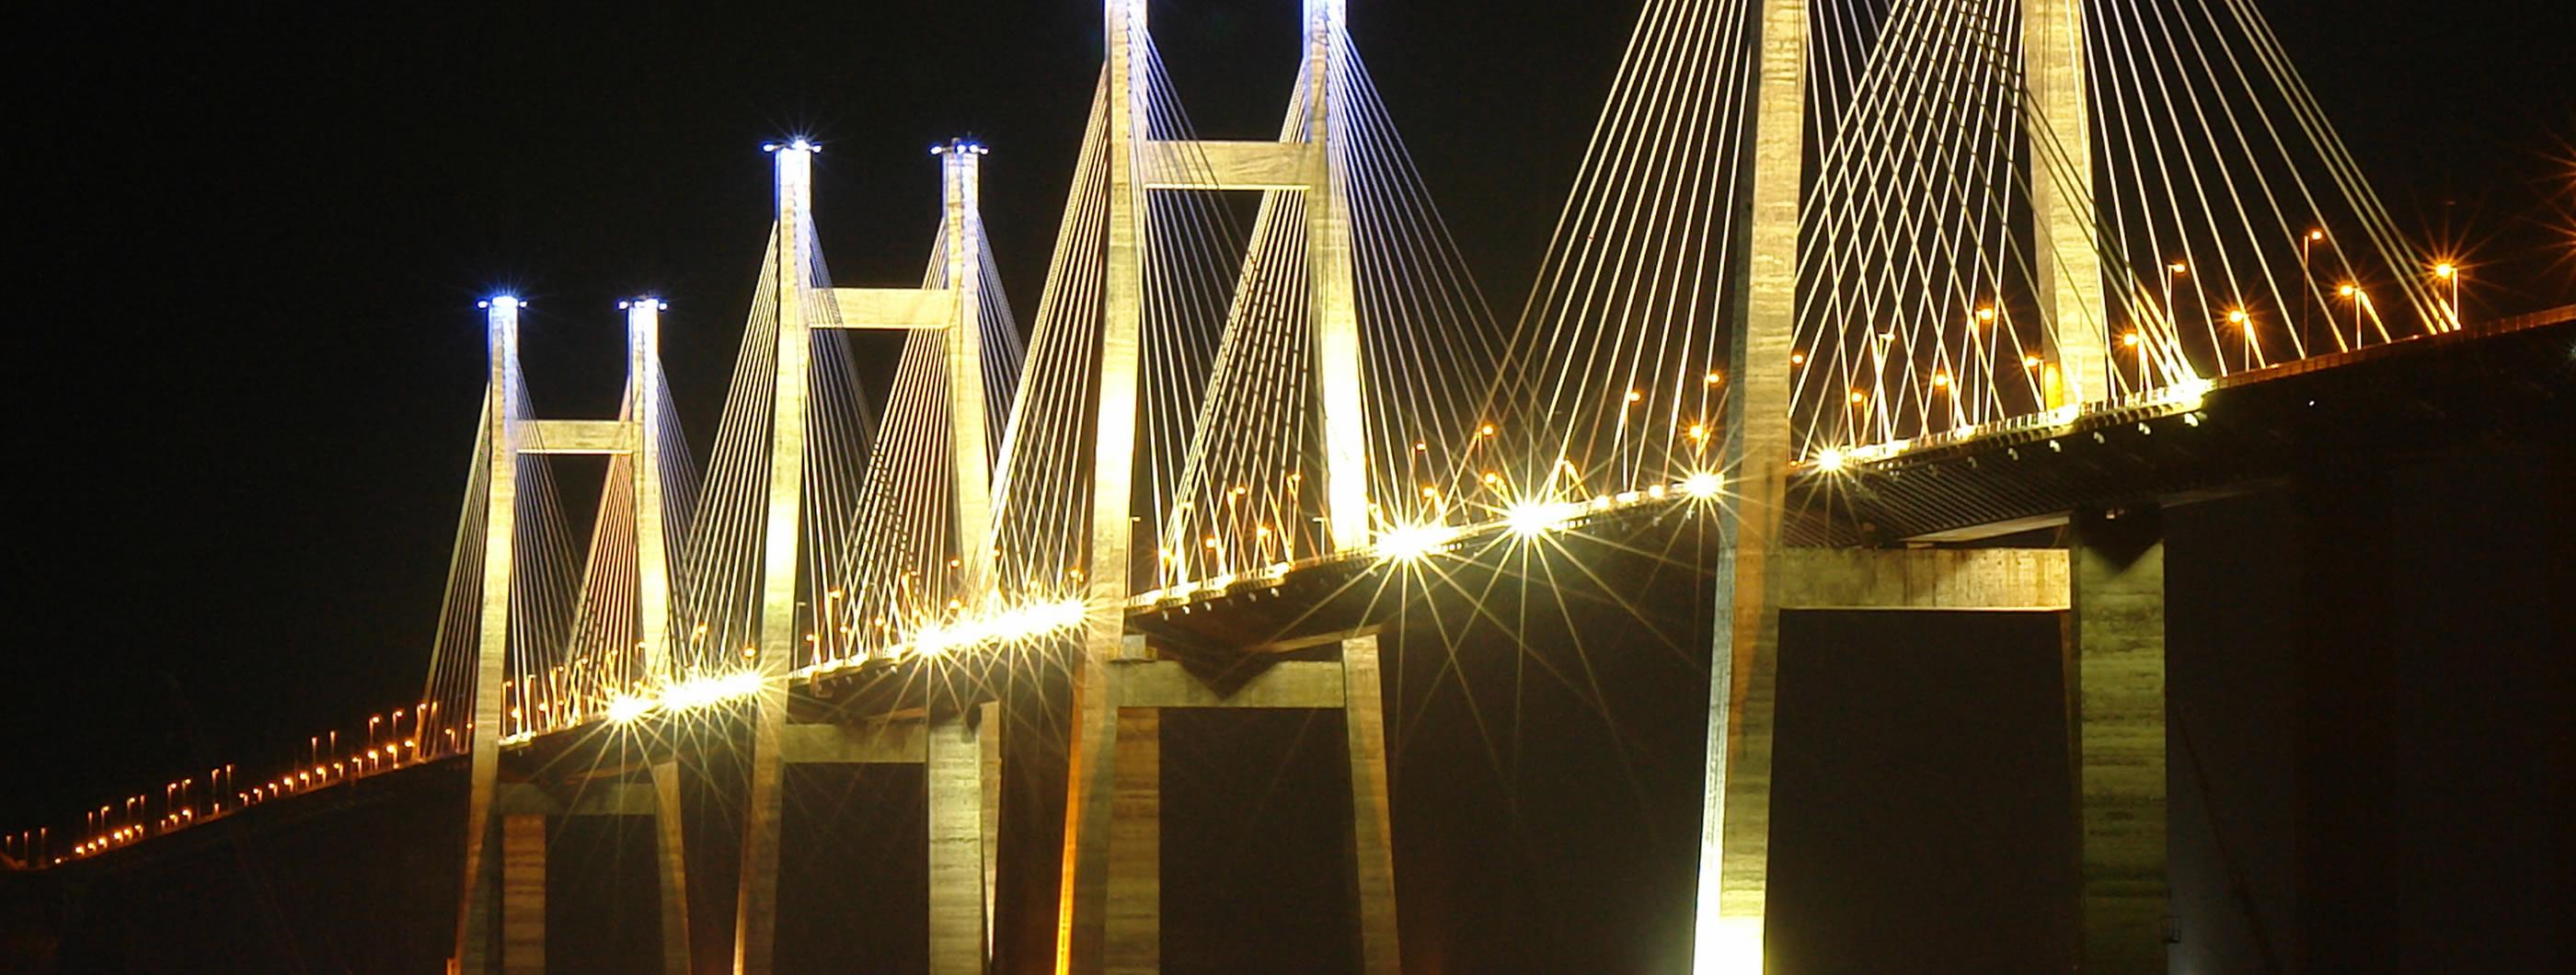 slide4-ponte-orinoco